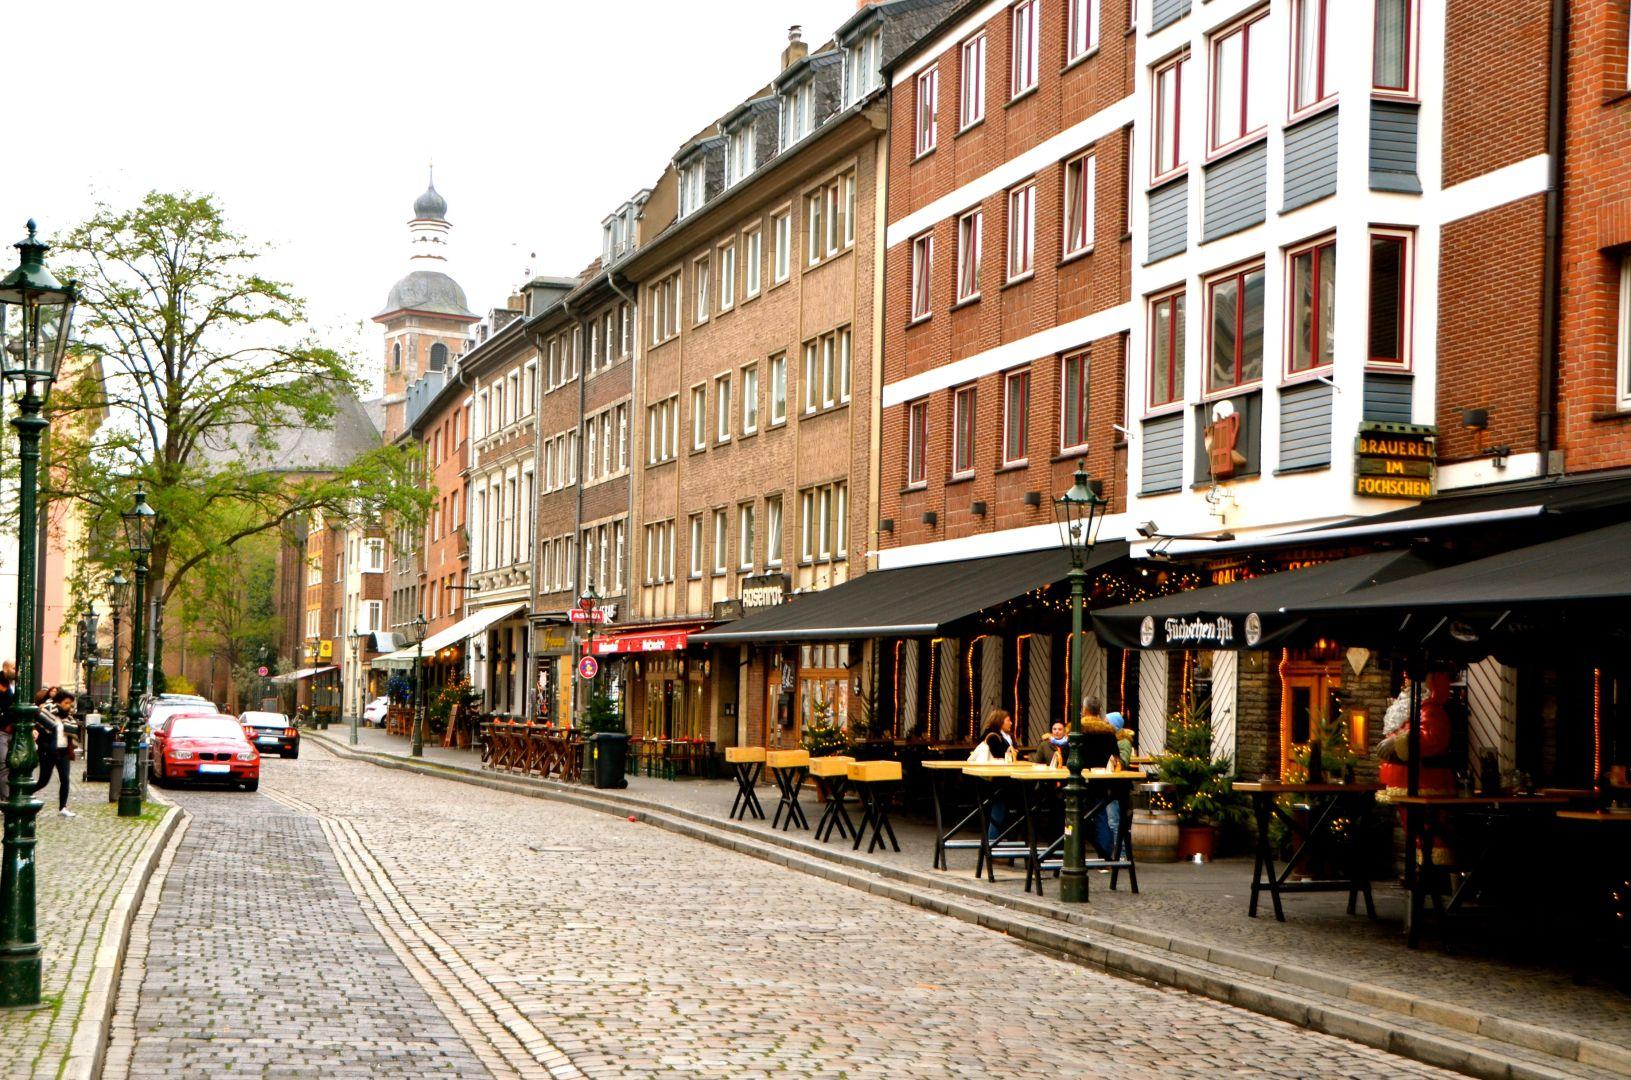 Altstad Düsseldorf